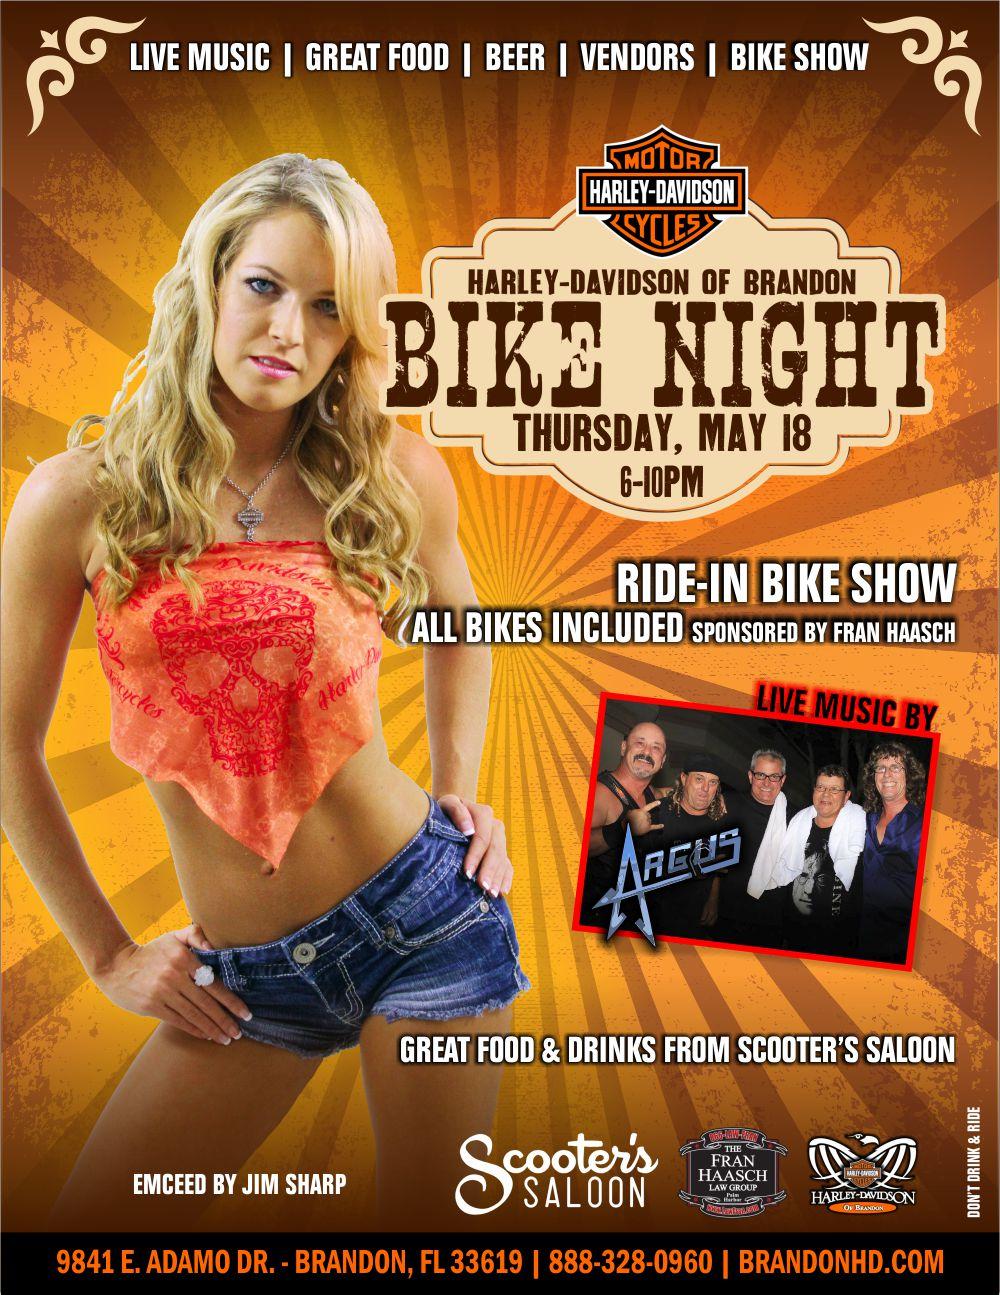 Bike Night at Brandon Harley-Davidson